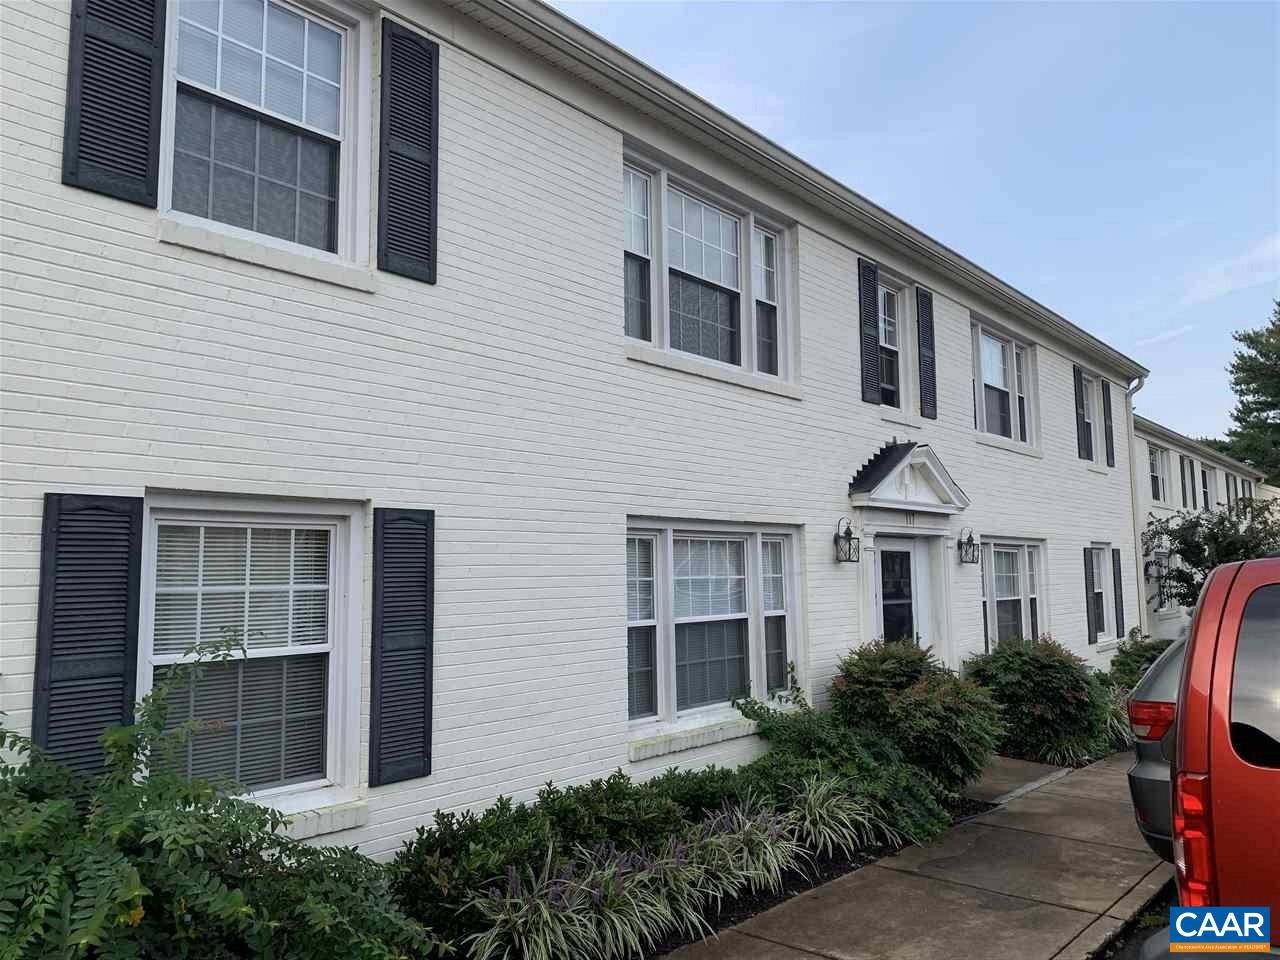 117 HESSIAN HILLS RDG, CHARLOTTESVILLE, VA 22901